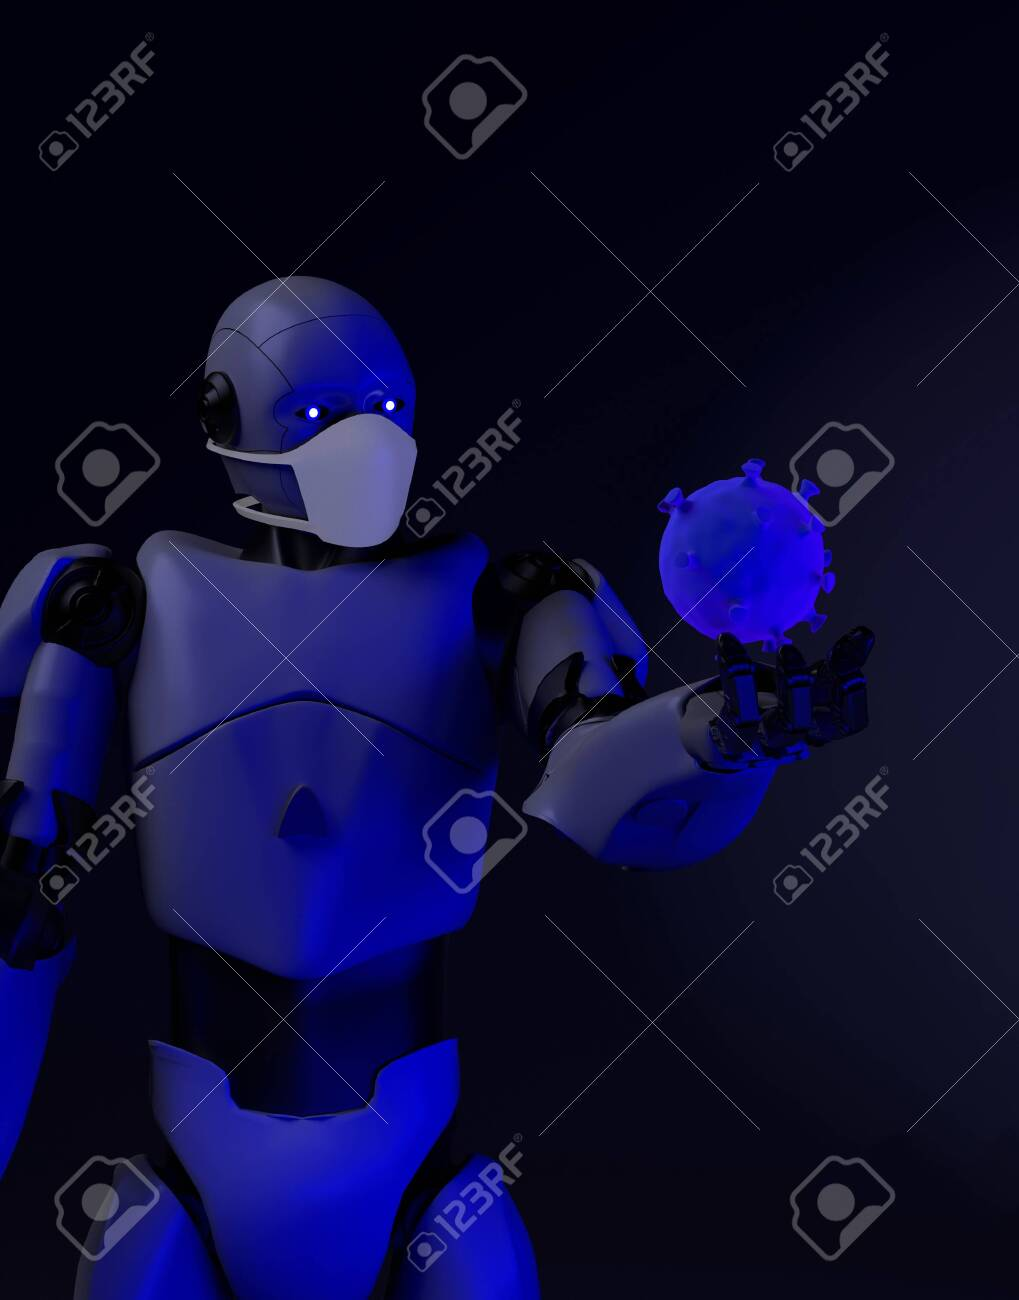 The robot studies a coronavirus with gauze mask medical,nano robot with bacterium,3d render. - 143238467